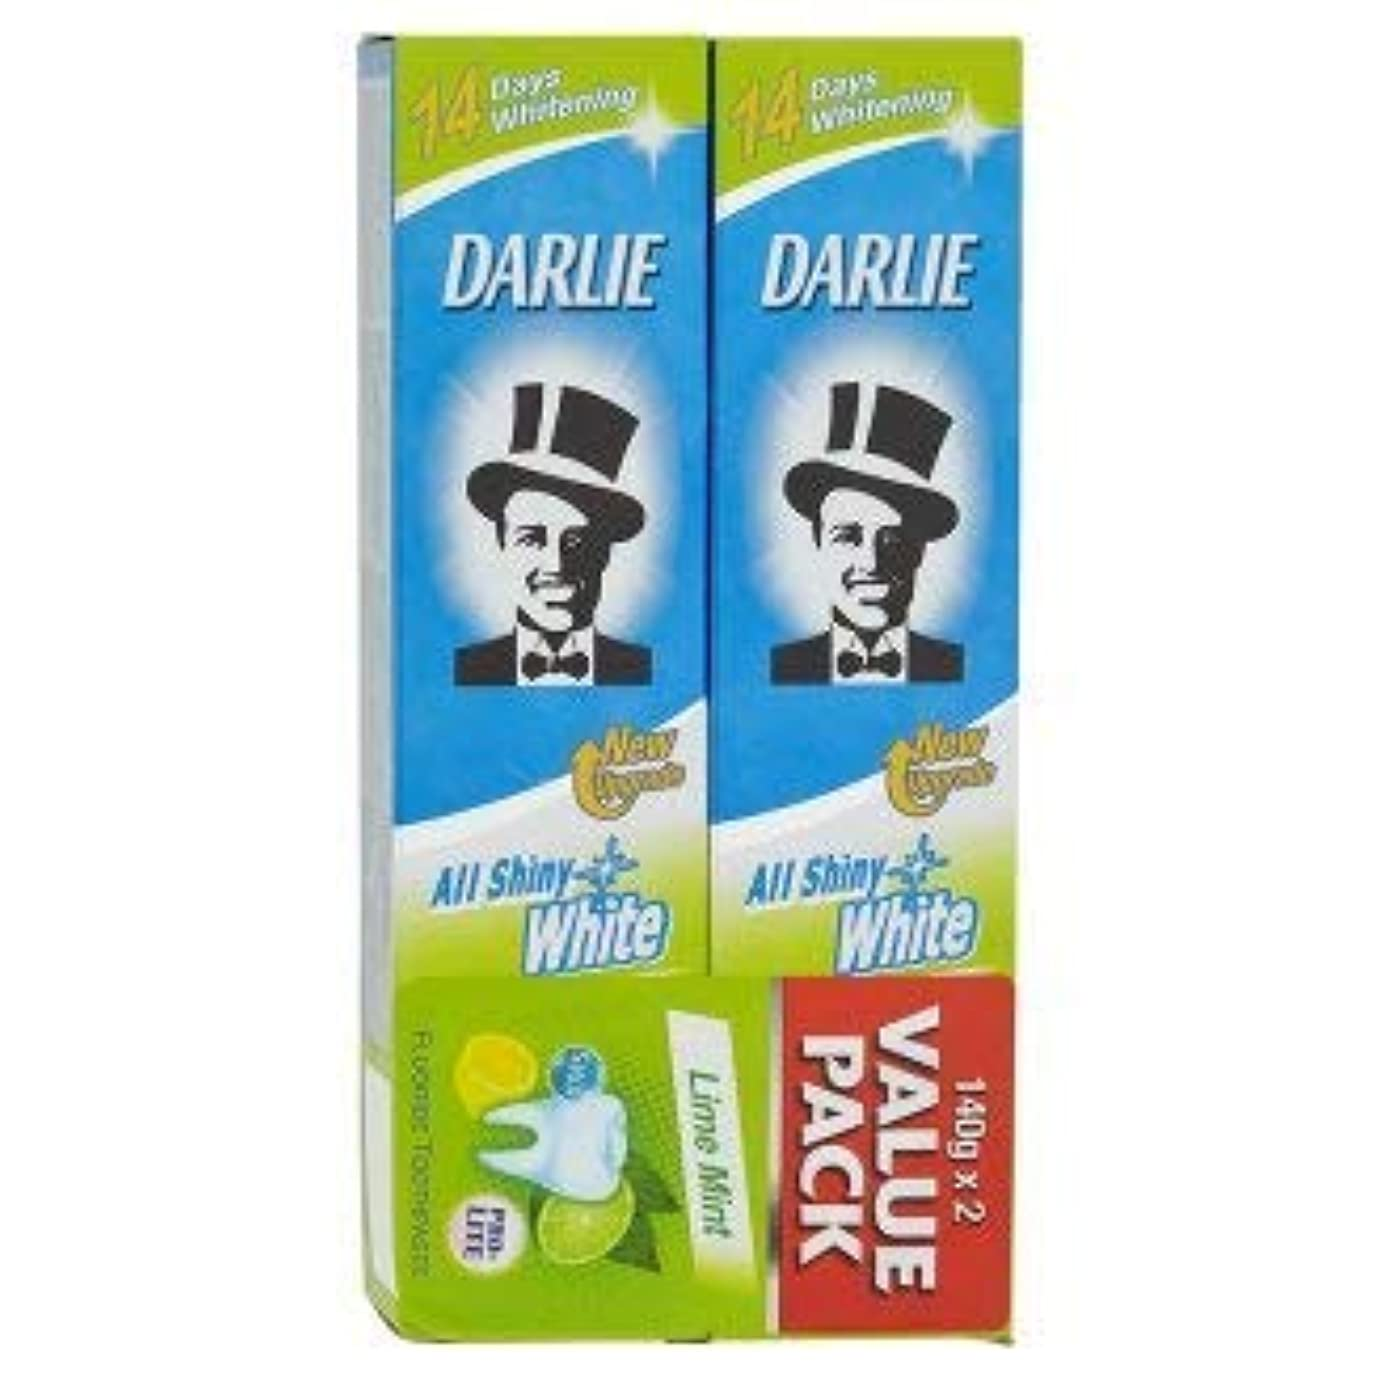 DARLIE 2つの電力可溶性汚れや緩やかな歯のホワイトニングを提供する新しいデュアルホワイトニングシステム - 全光沢のある白ライムミント140グラム値パックX2を歯磨き粉